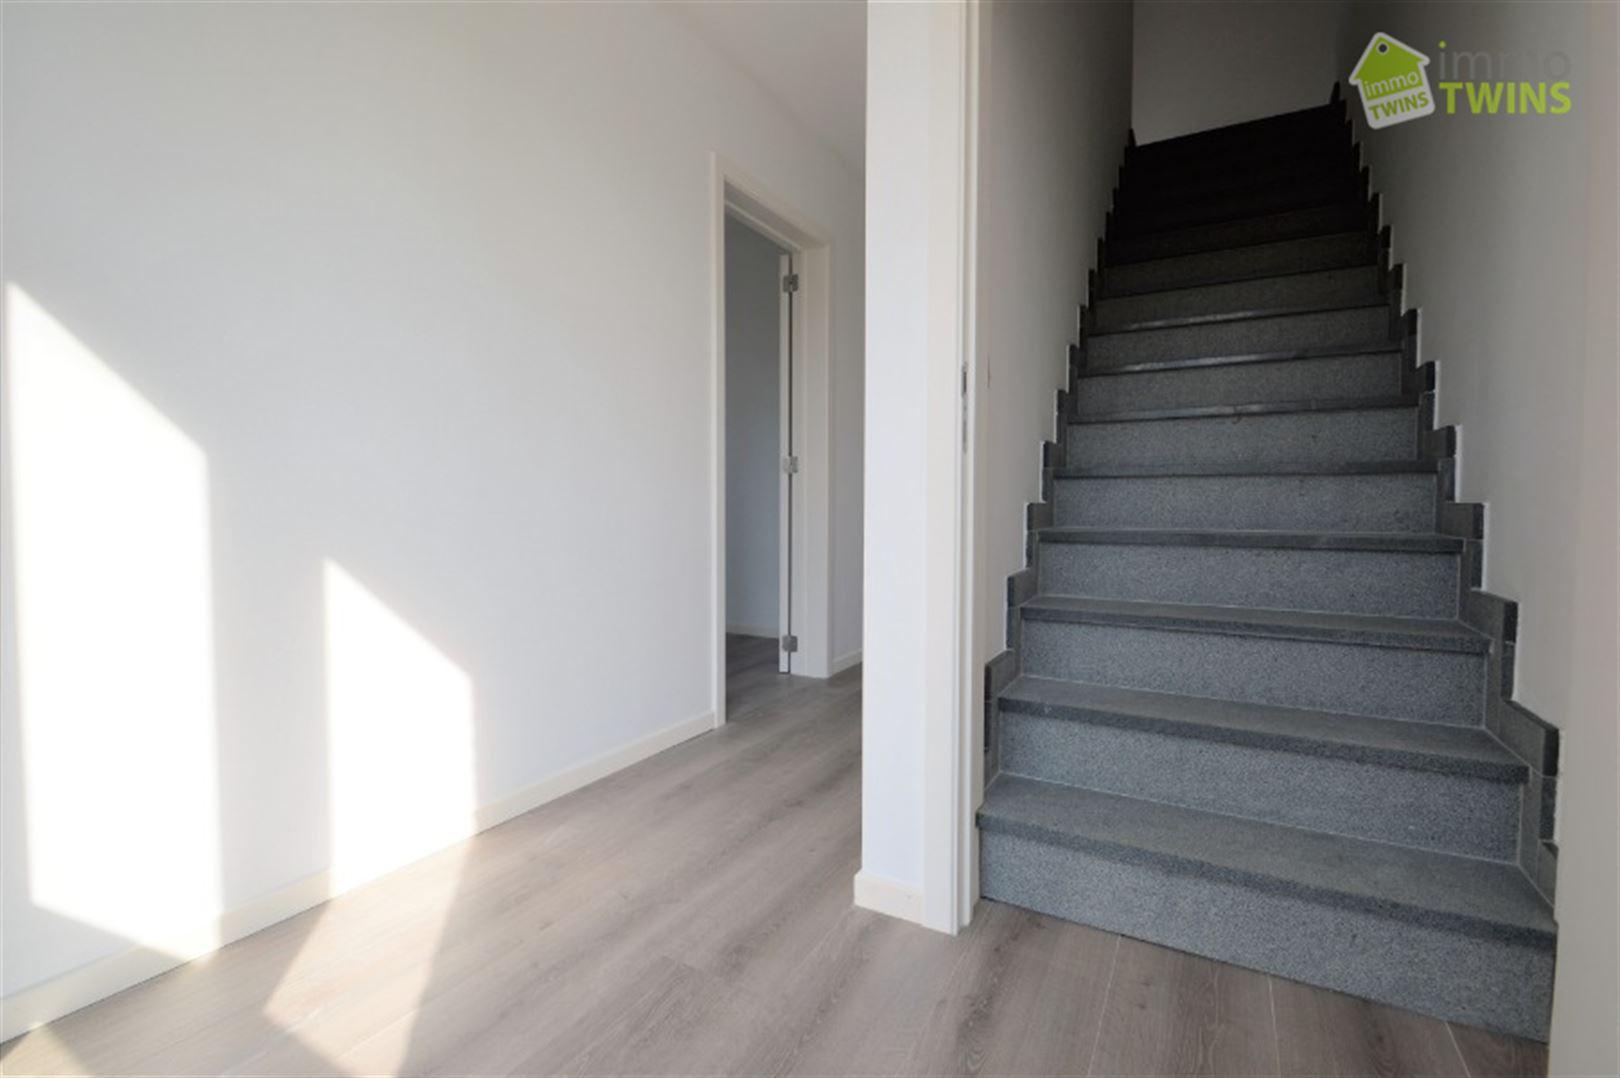 Foto 20 : Woning te 9200 Sint-Gillis-bij-Dendermonde (België) - Prijs € 999